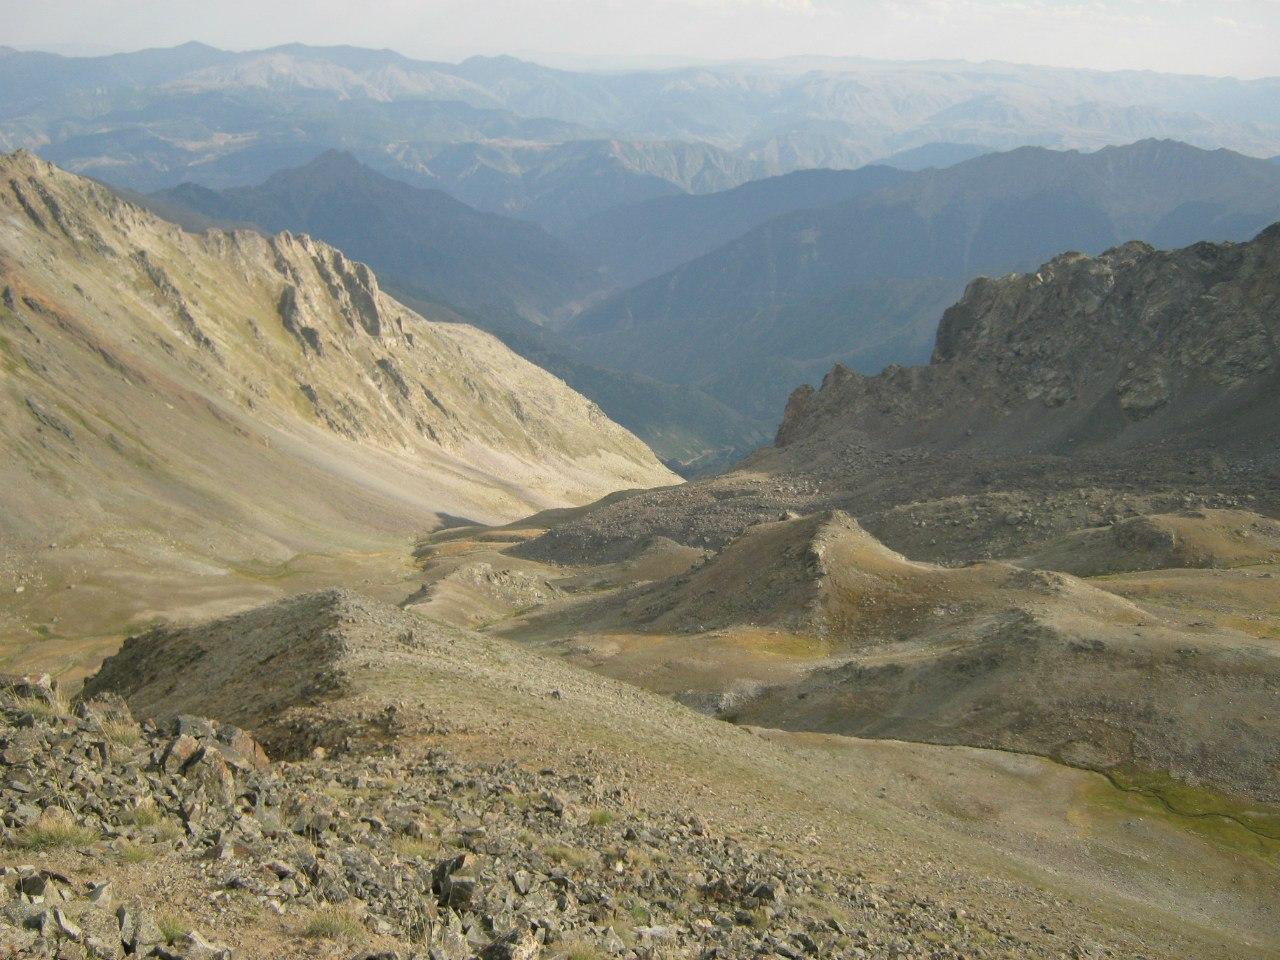 Пейзажи со хребта между районами Юсуфели и Испир